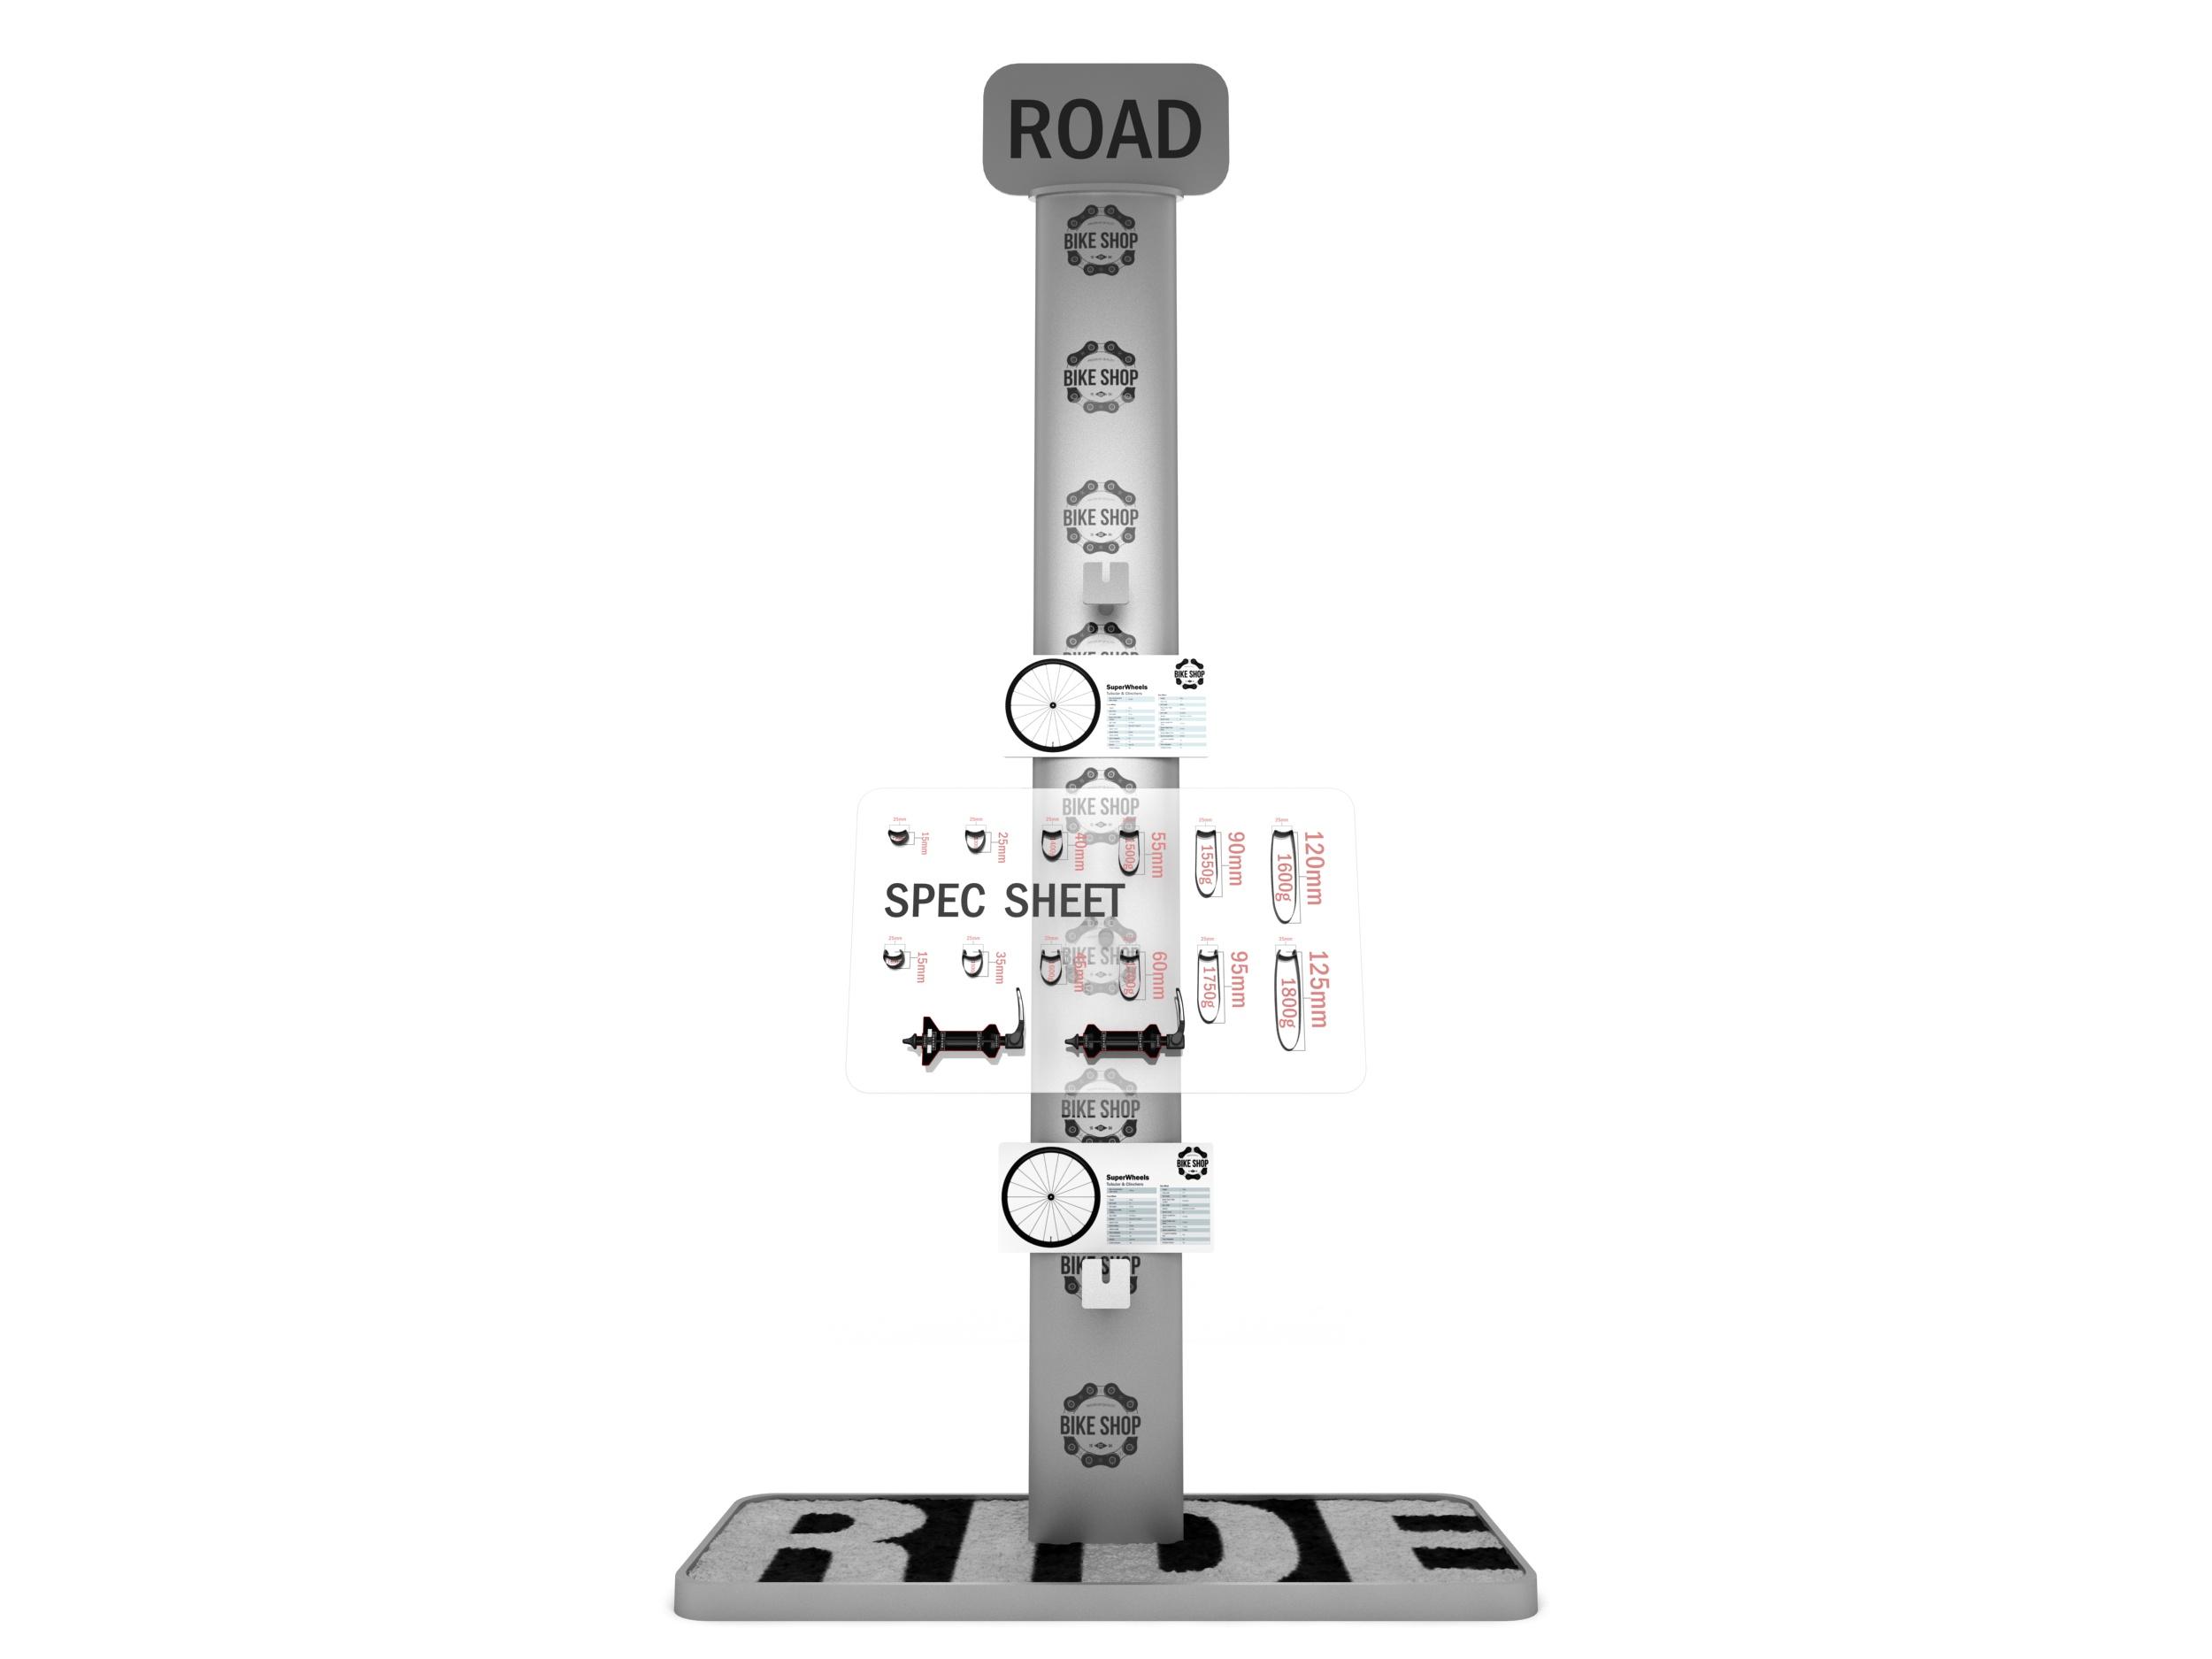 POS_Road Wheel Stand_014.jpg